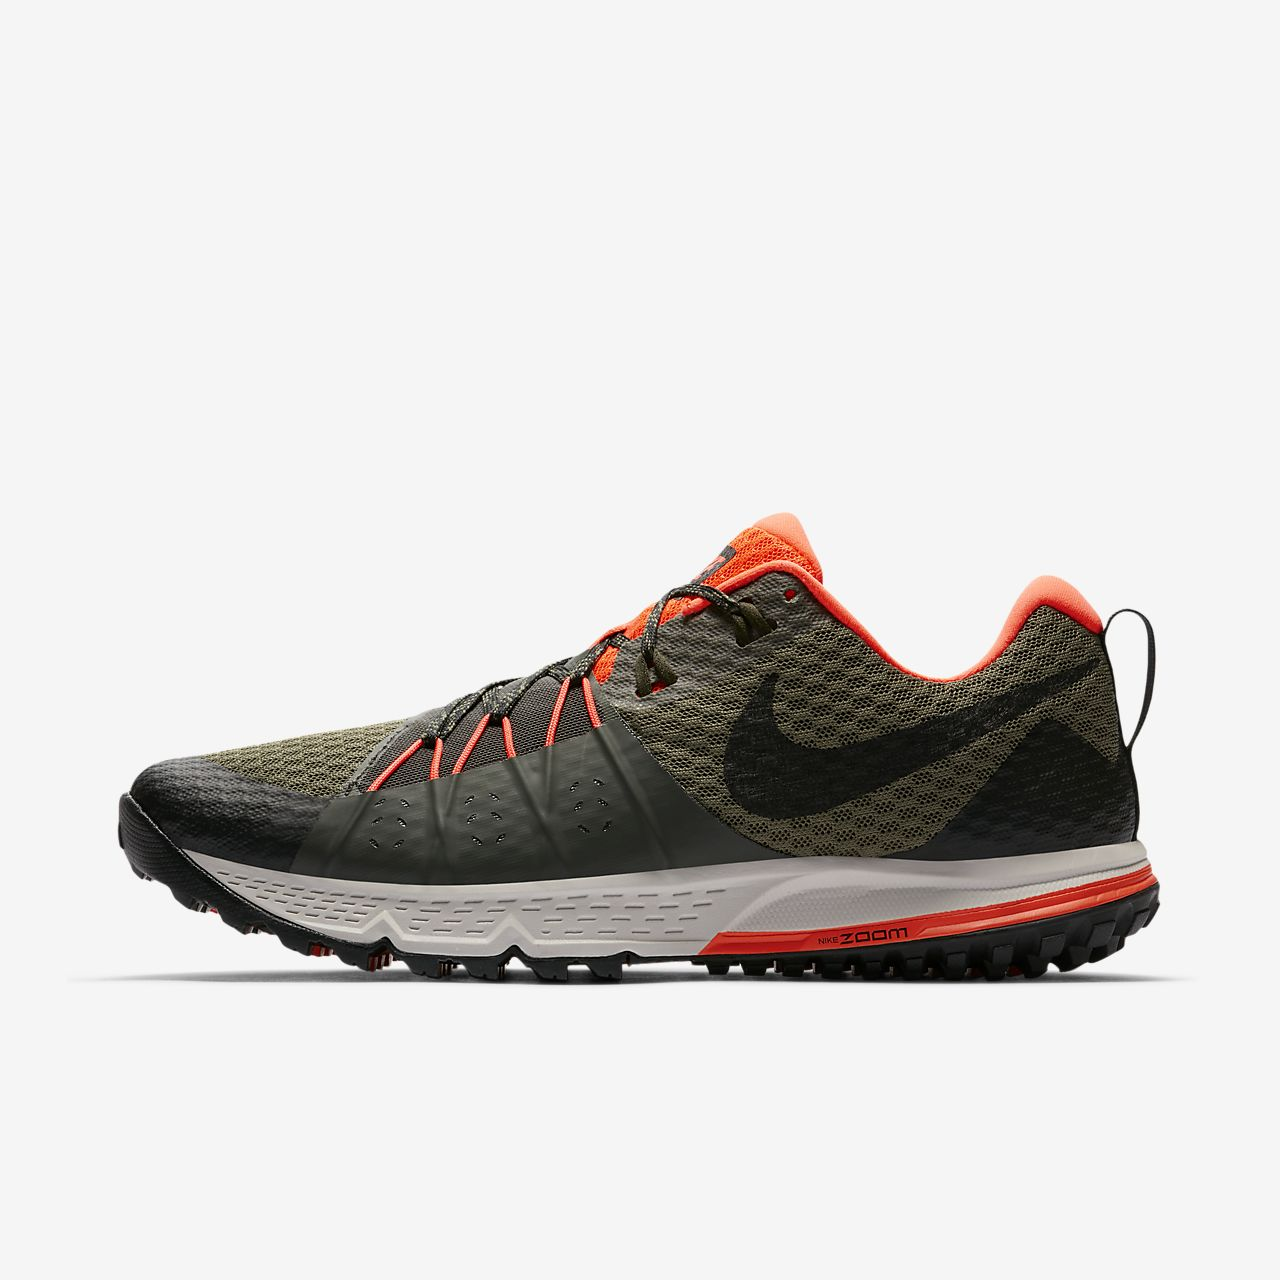 Nike Nike Air Zoom Wildhorse IV men's Shoes